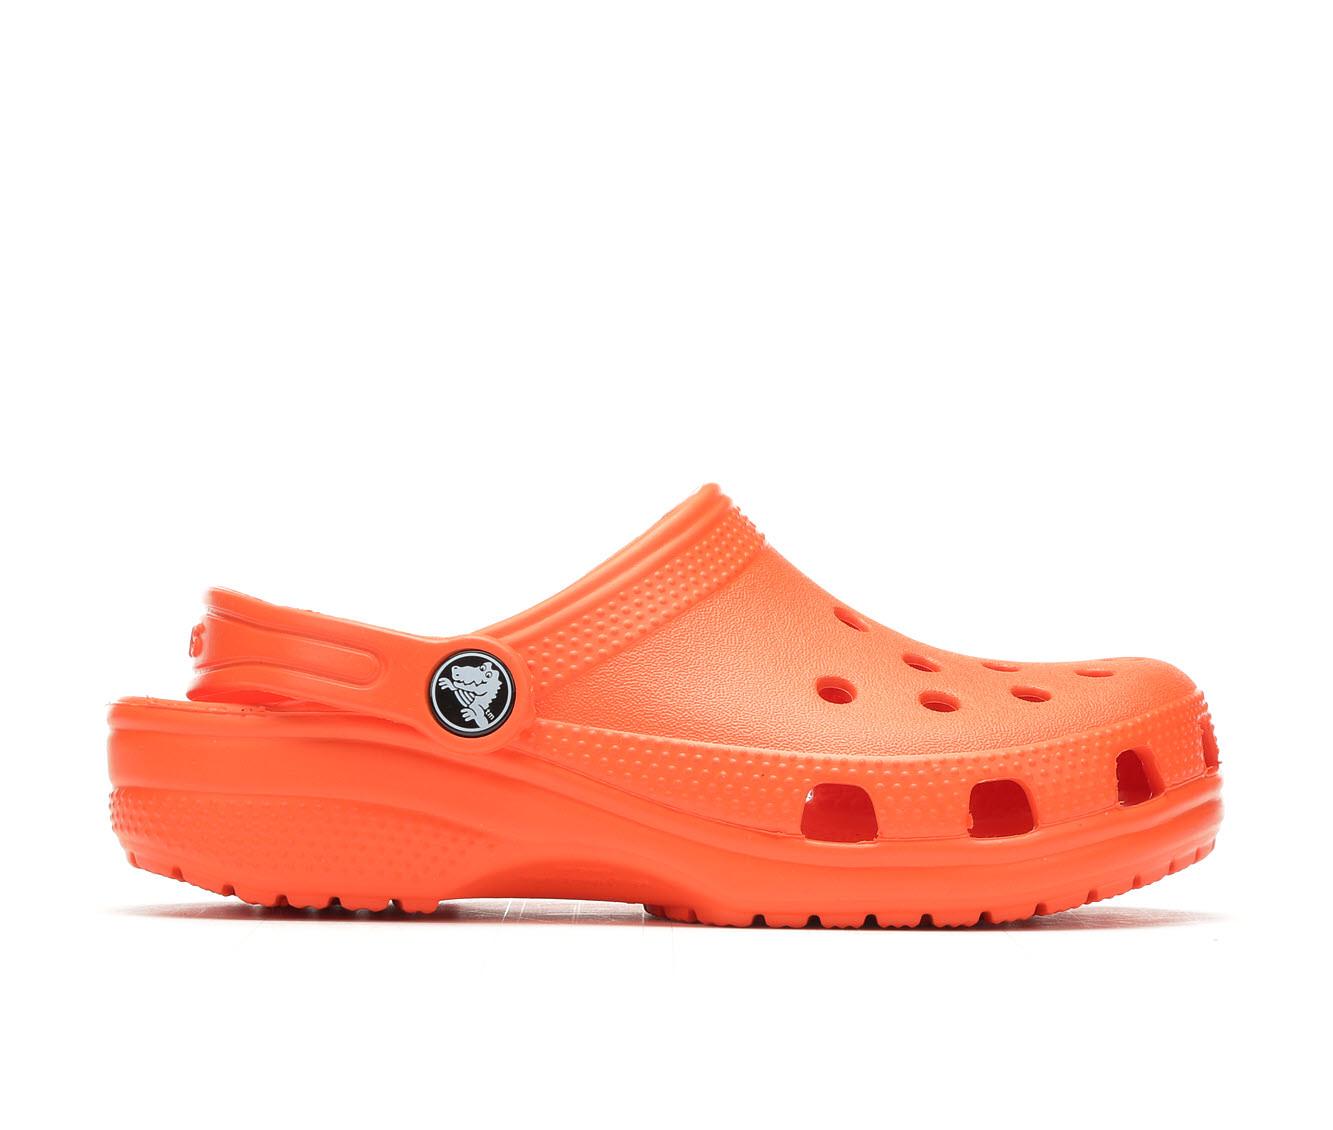 Girls' Crocs Infant Classic Clog Children's Shoes (Orange)